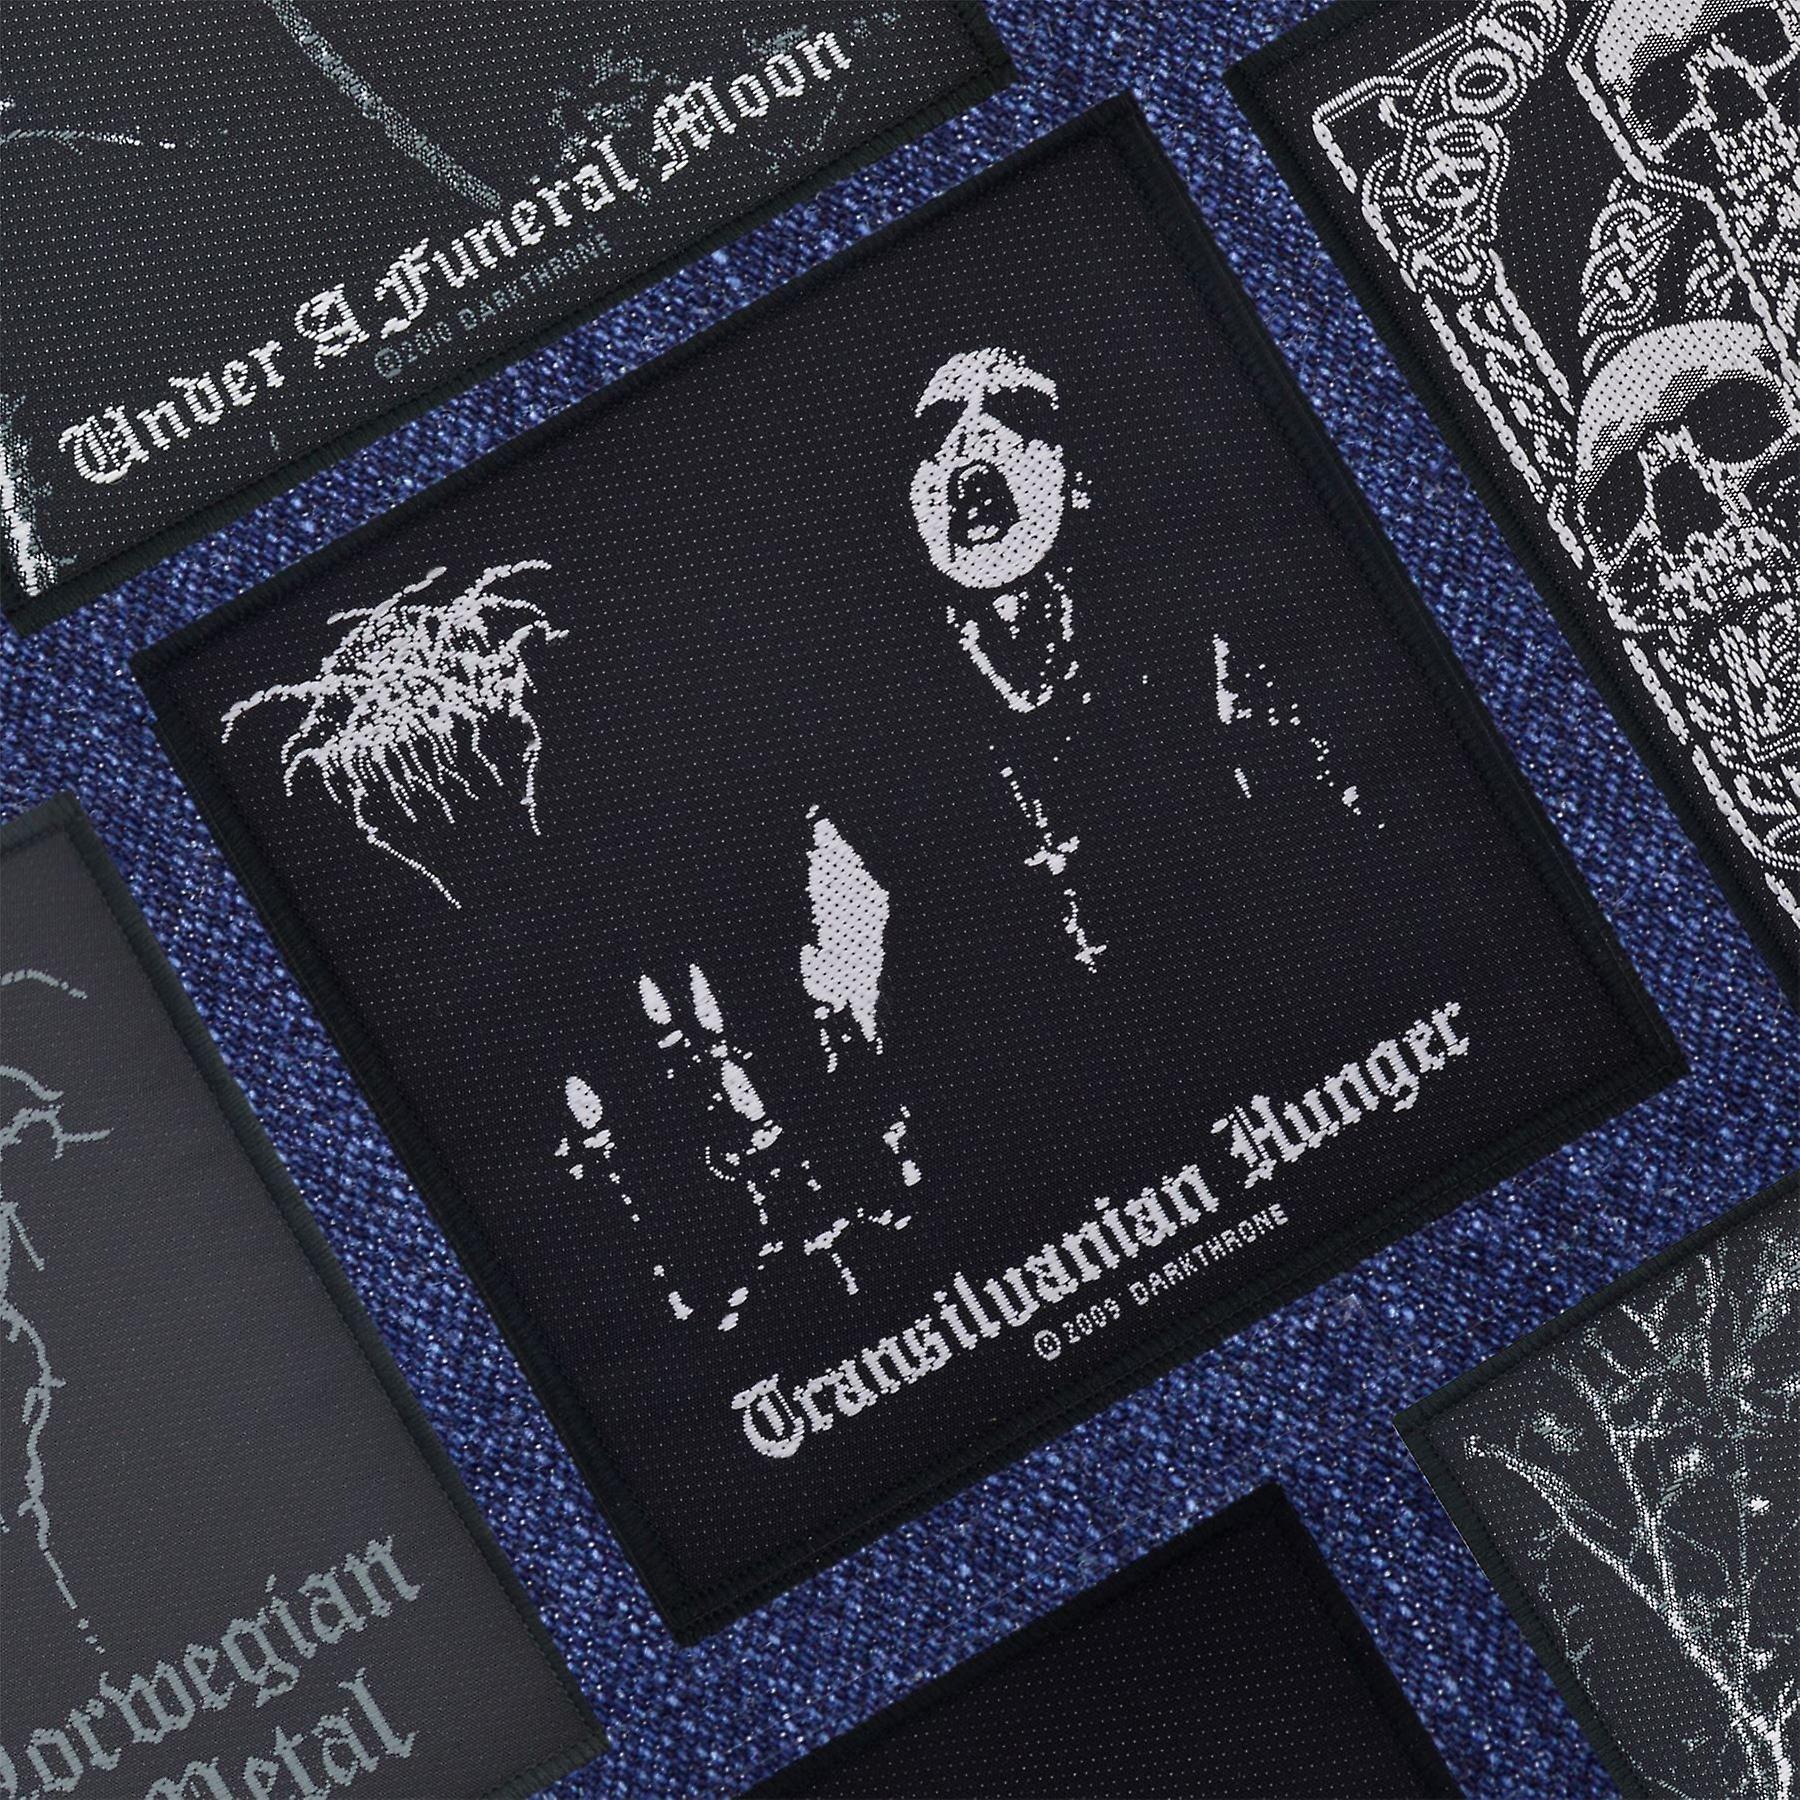 Darkthrone Transilvanian Hunger Woven Patch